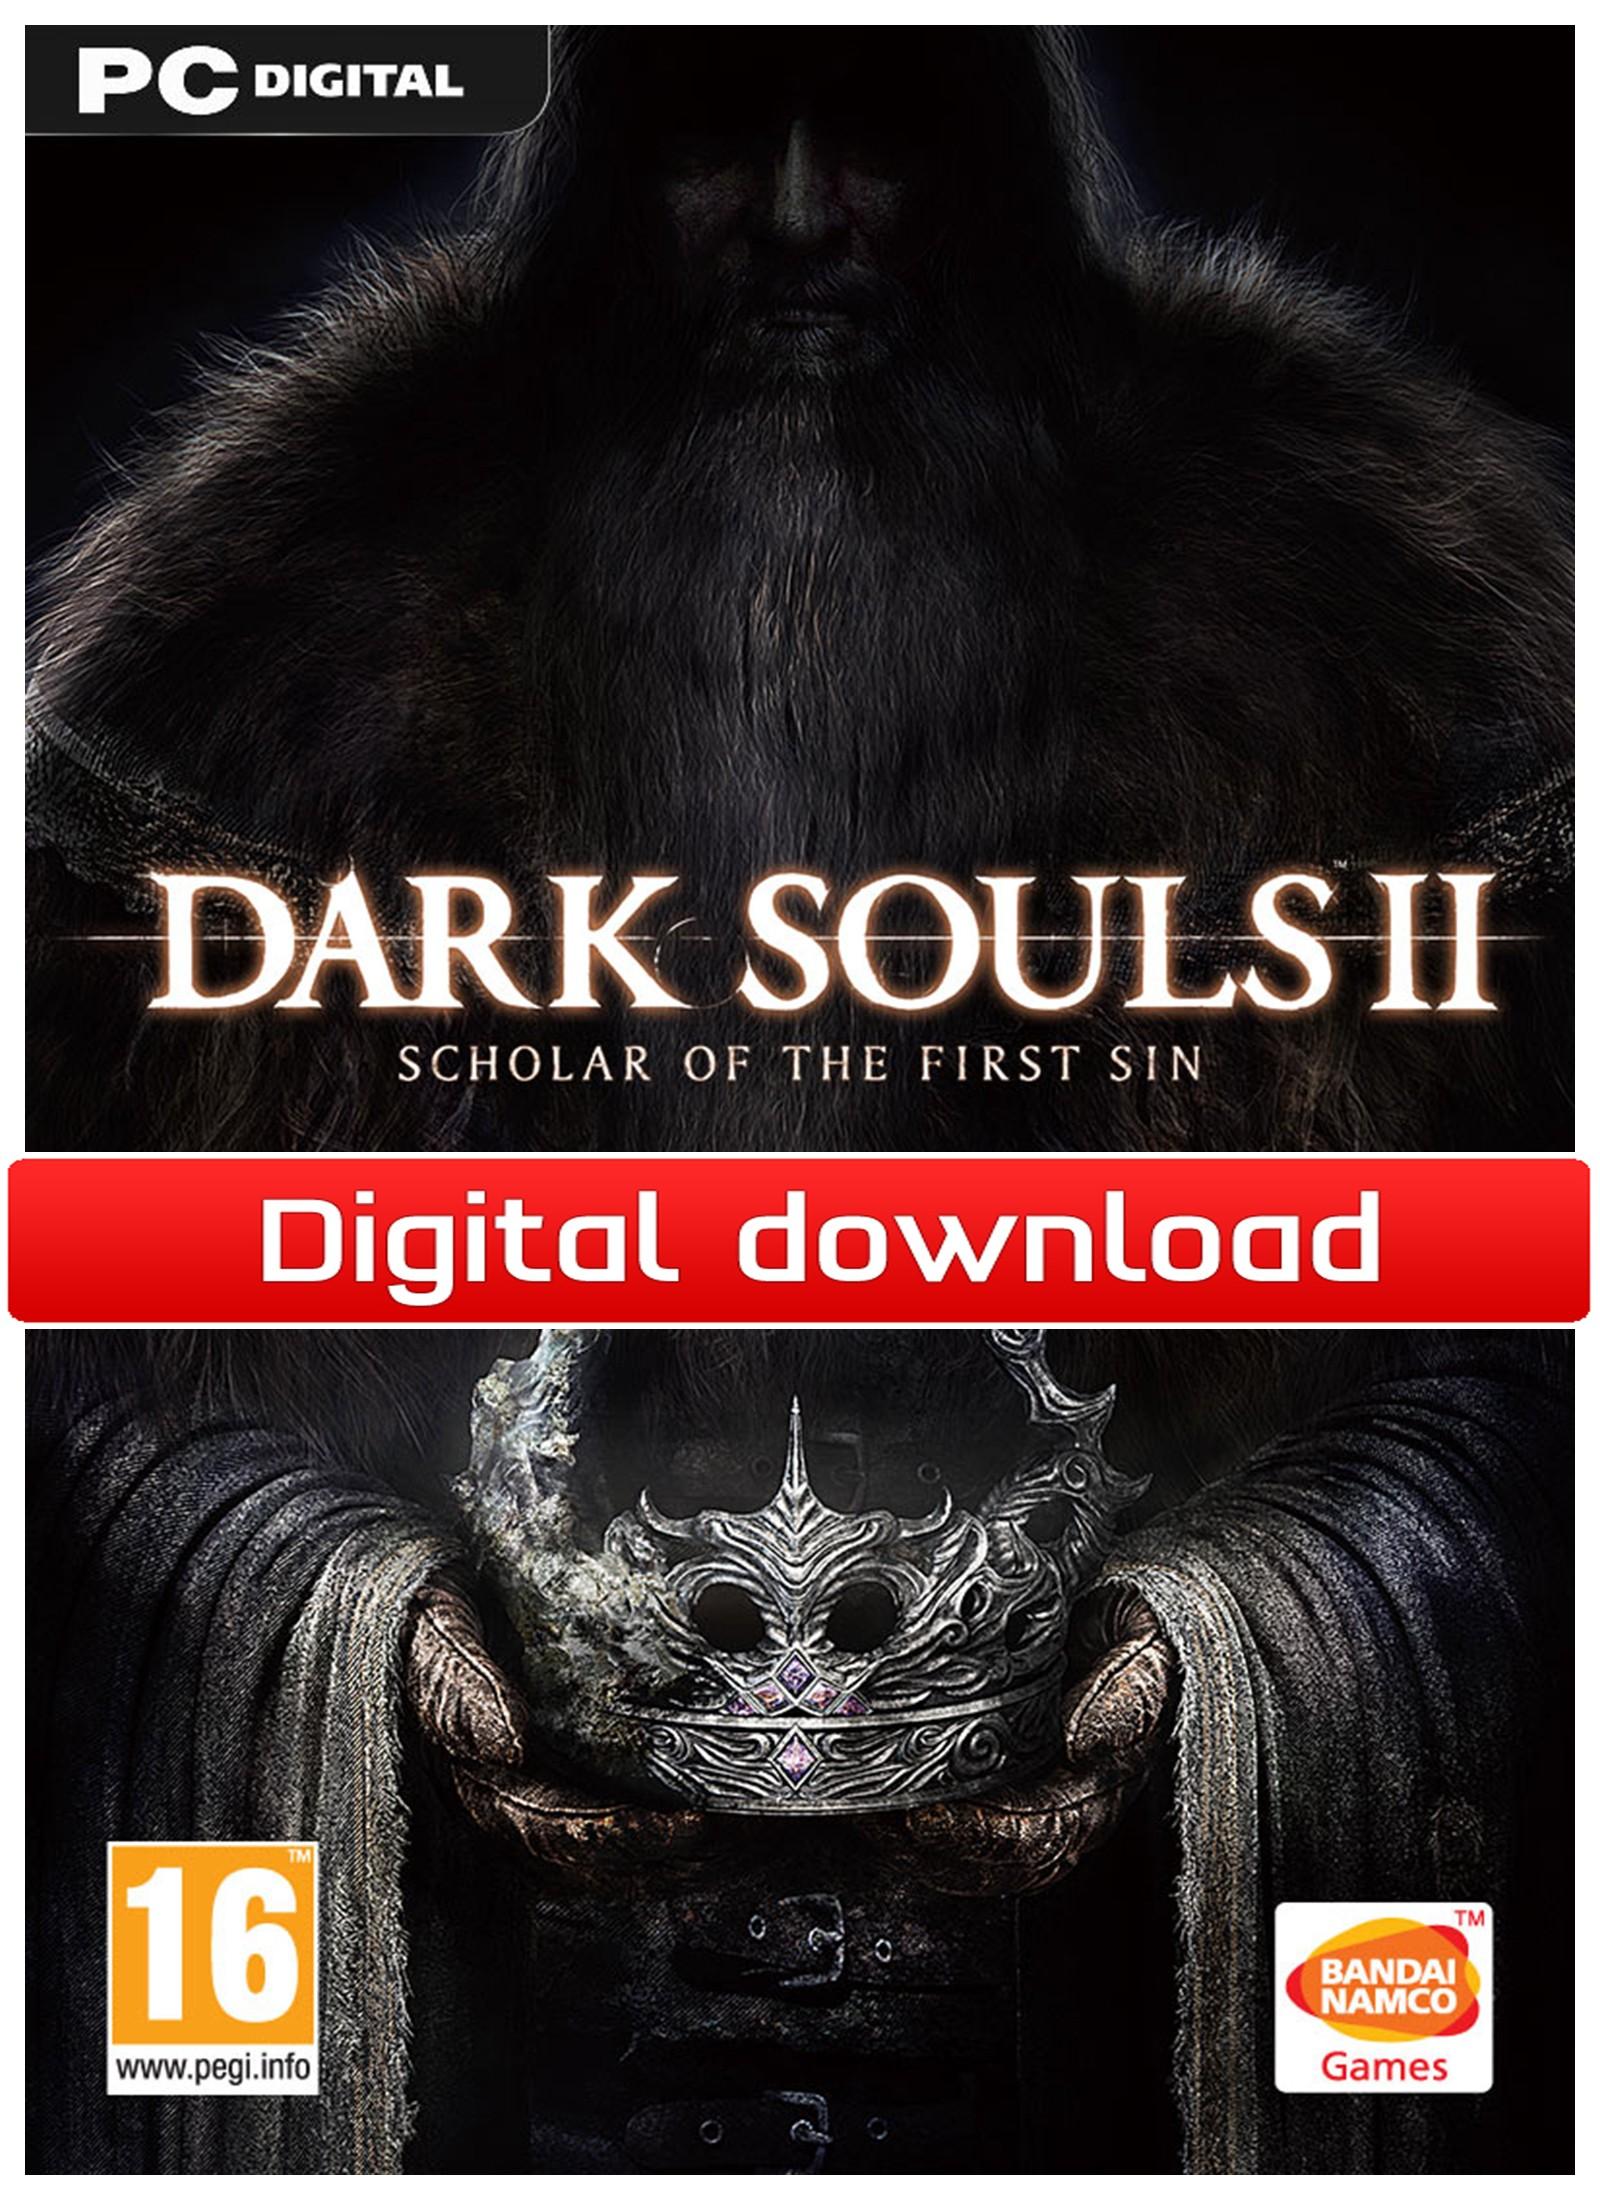 36973 : Dark Souls 2: Scholar of the First Sin (PC nedlastning)